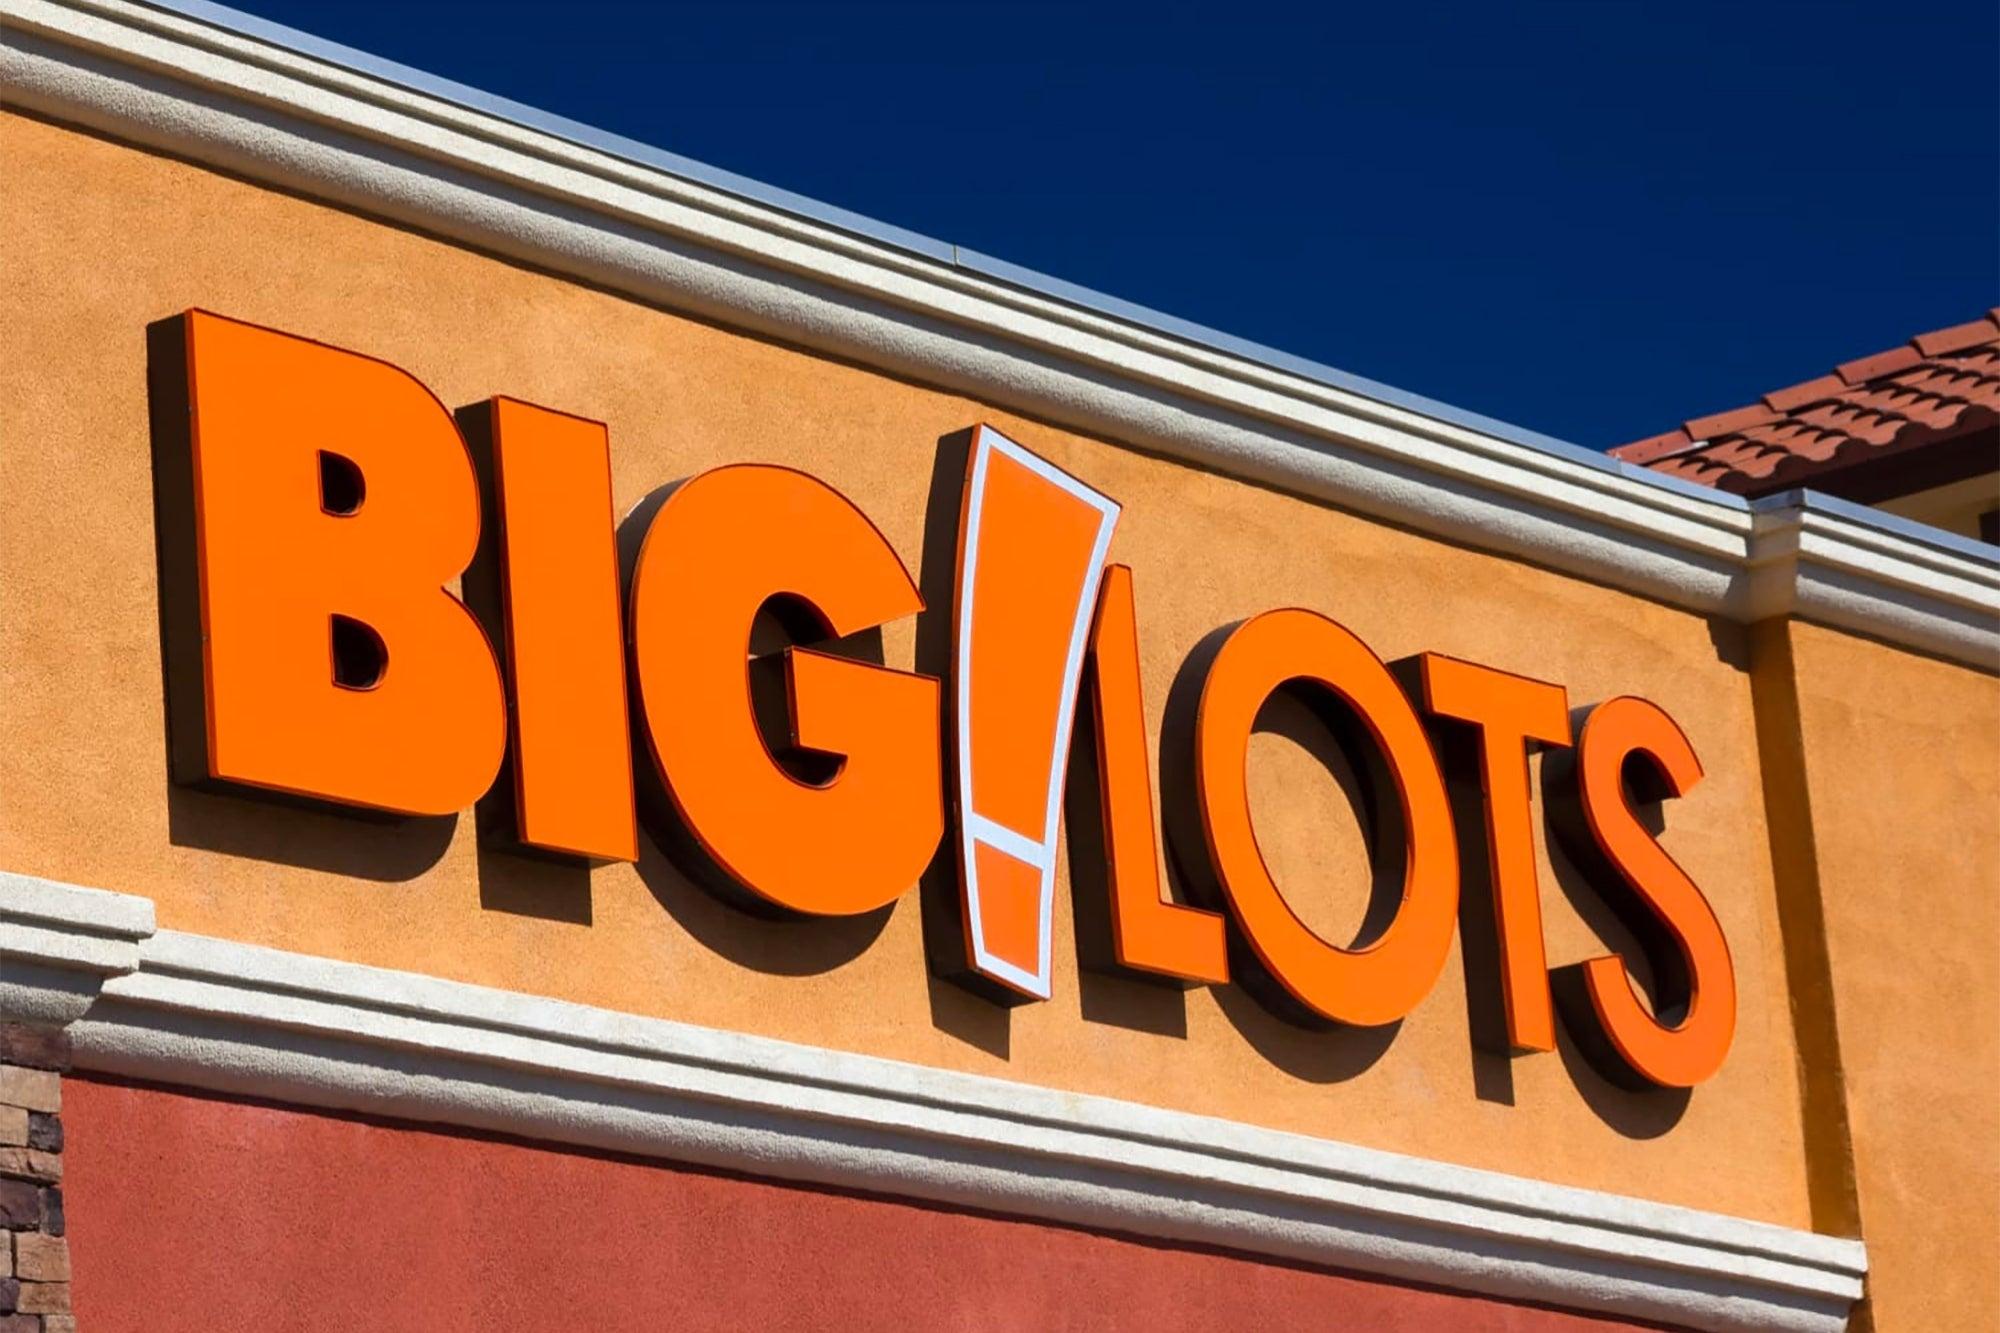 Big Lots Follows North Star To Profits, You Should Too